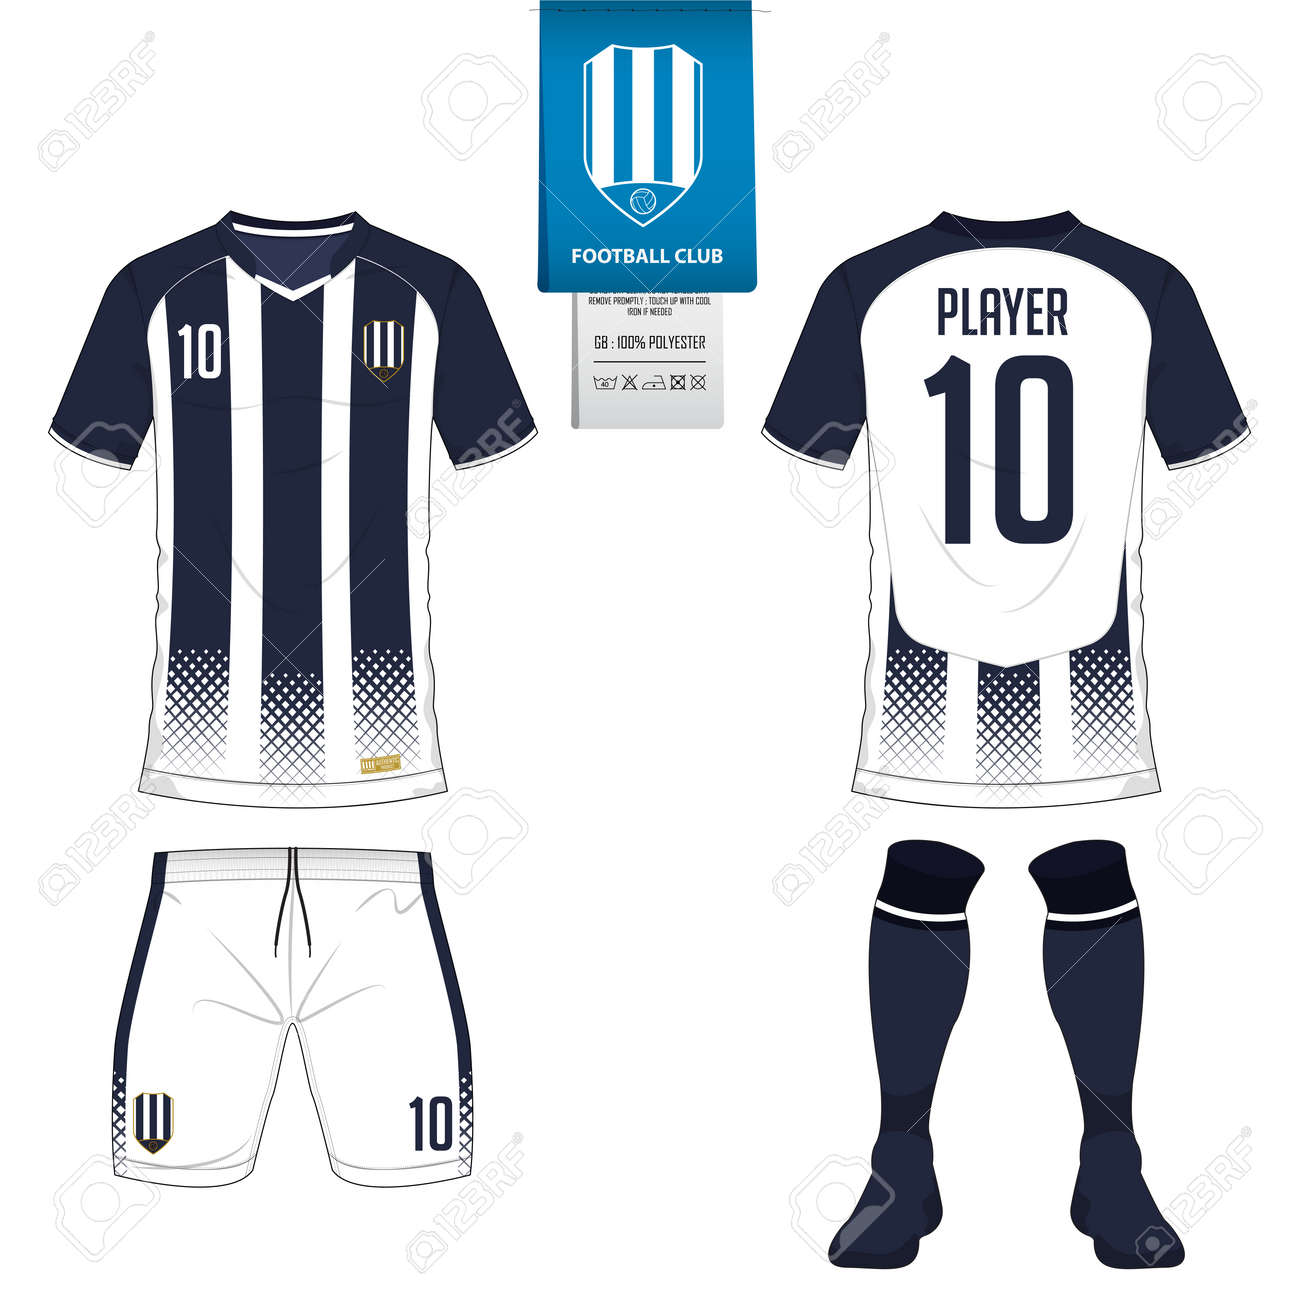 Soccer jersey or football kit, short, sock template for sport club. Football t-shirt mock up. - 86636730